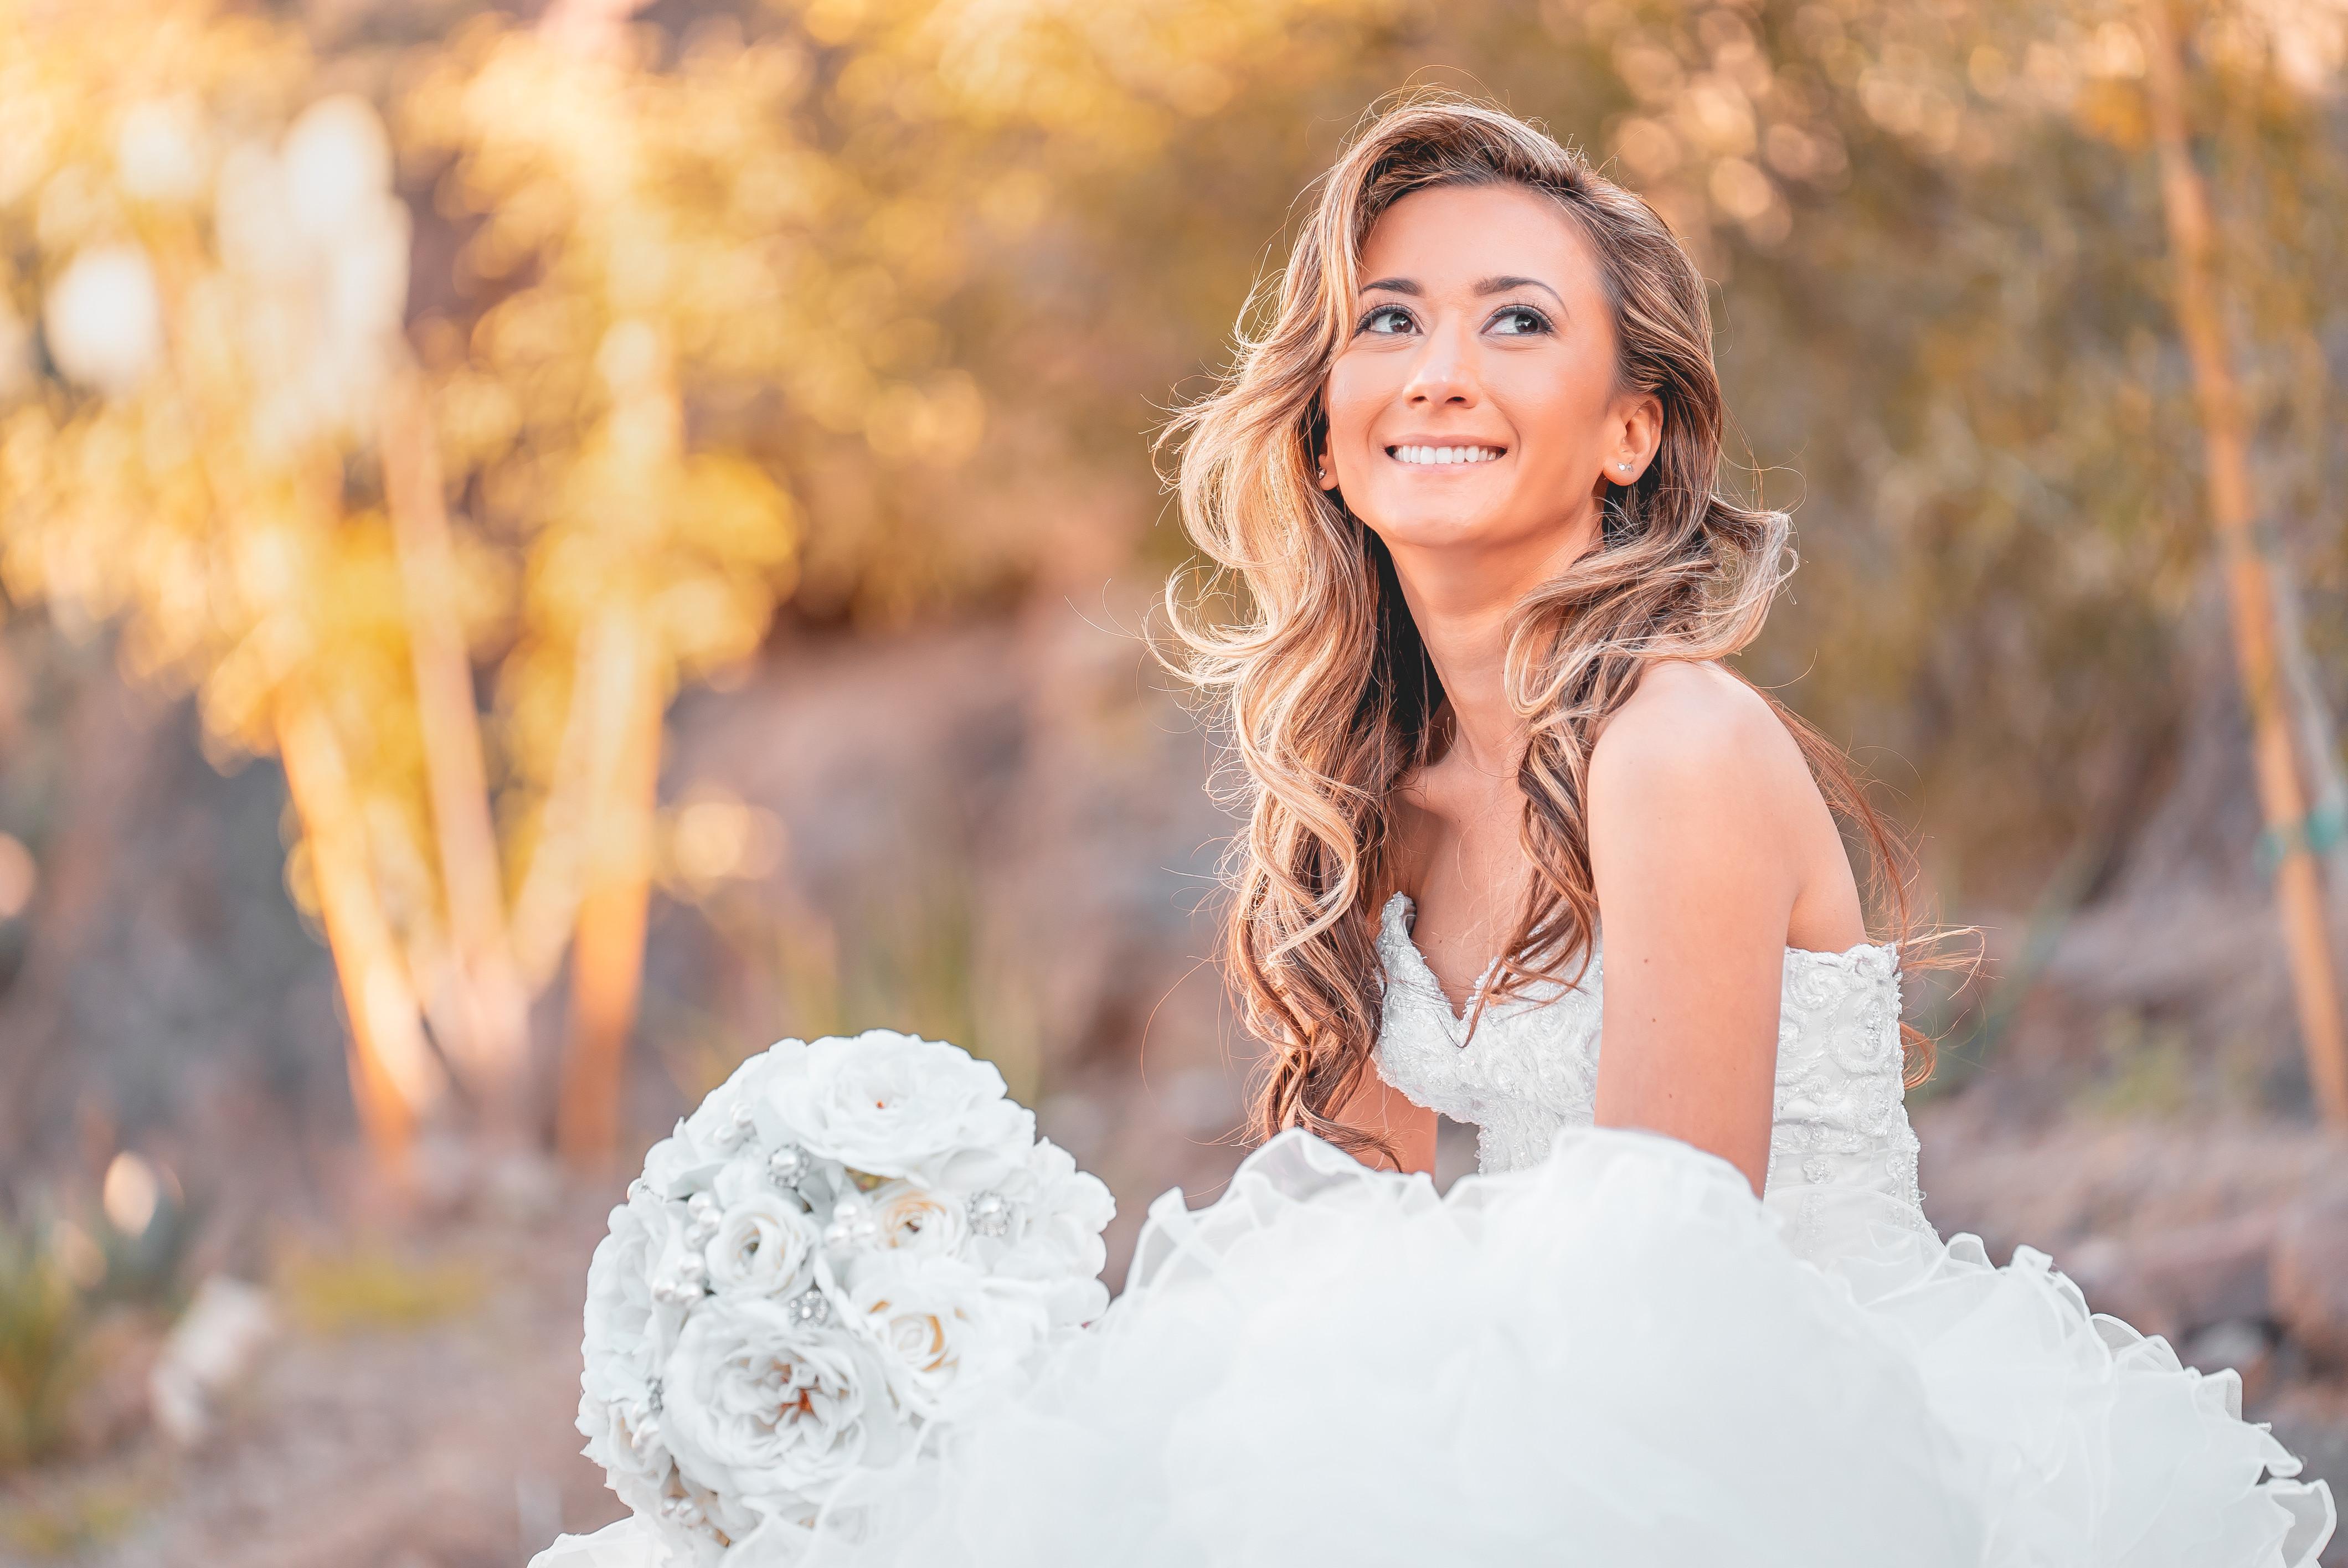 WEDDING PHOTOGRAPHY   Half Day